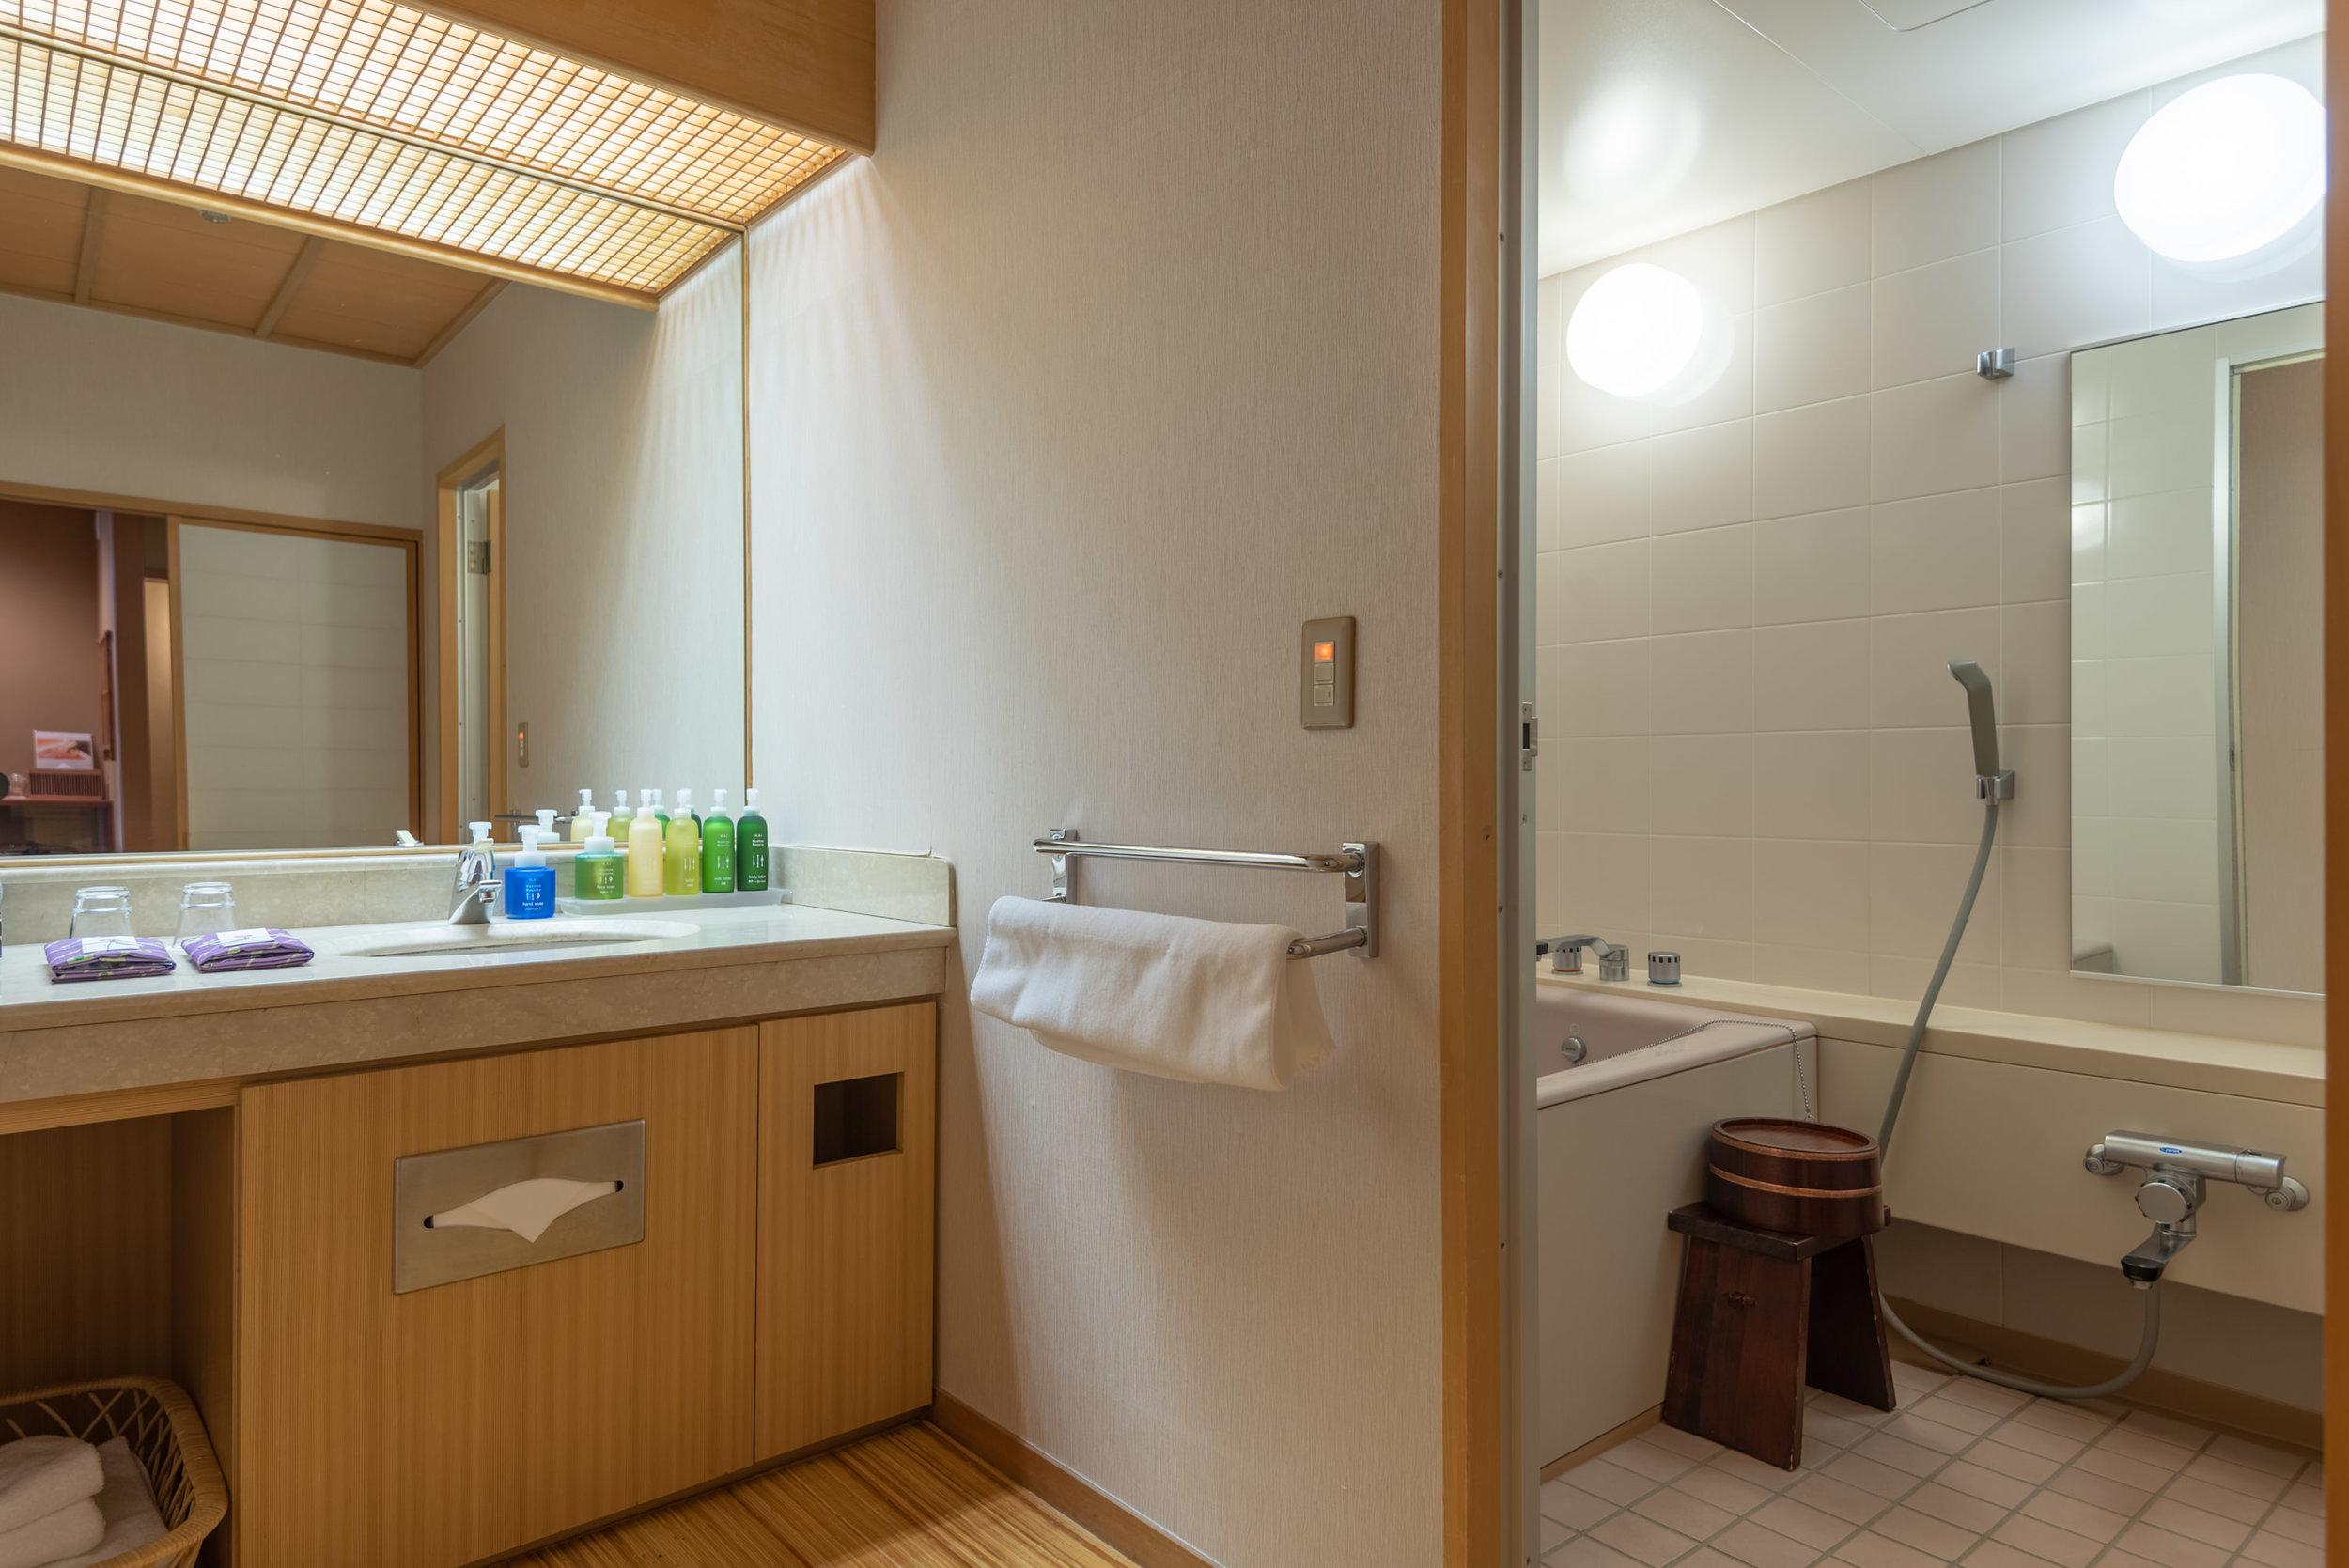 Bathroom and Bathtub  Japanese-style Room with Lake View GL2 - Hoshino Resorts KAI Nikko